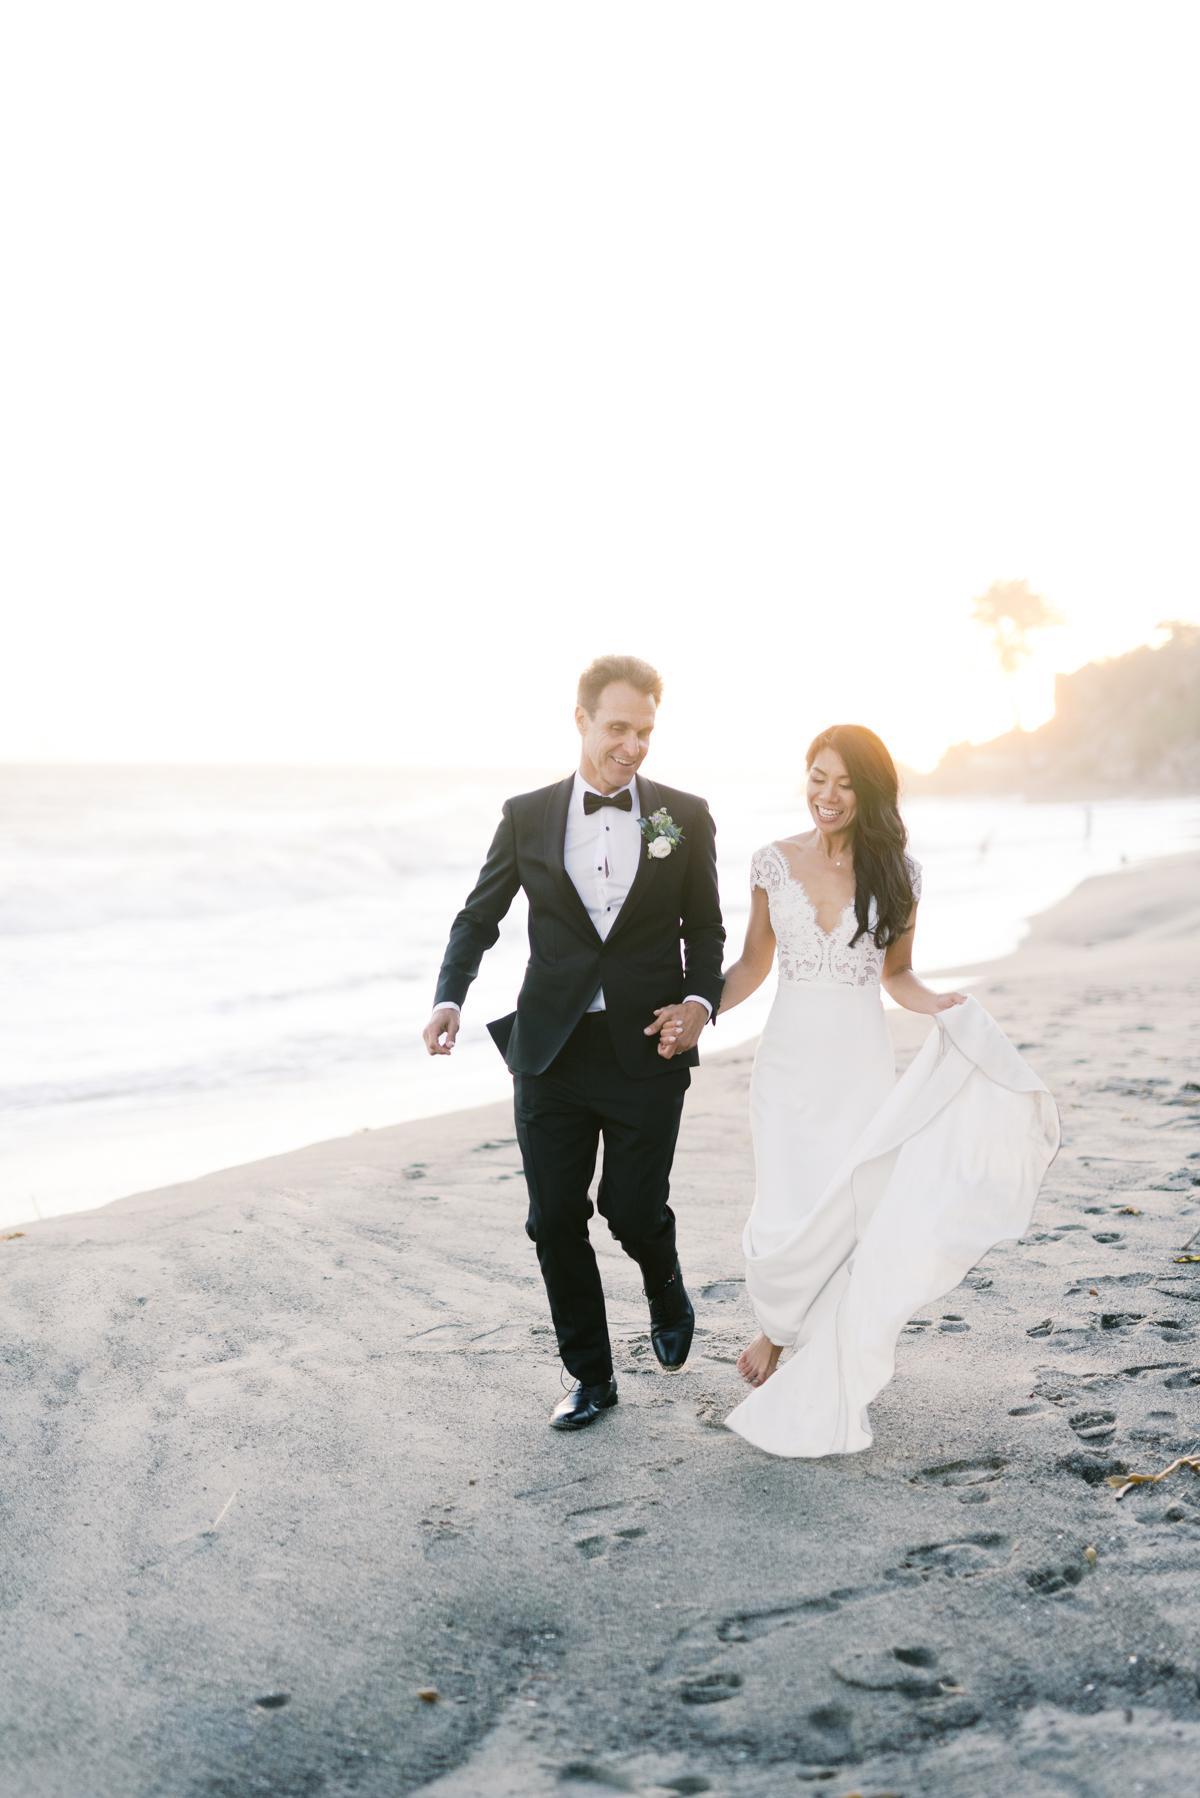 bettina gino wedding couple walking on beach